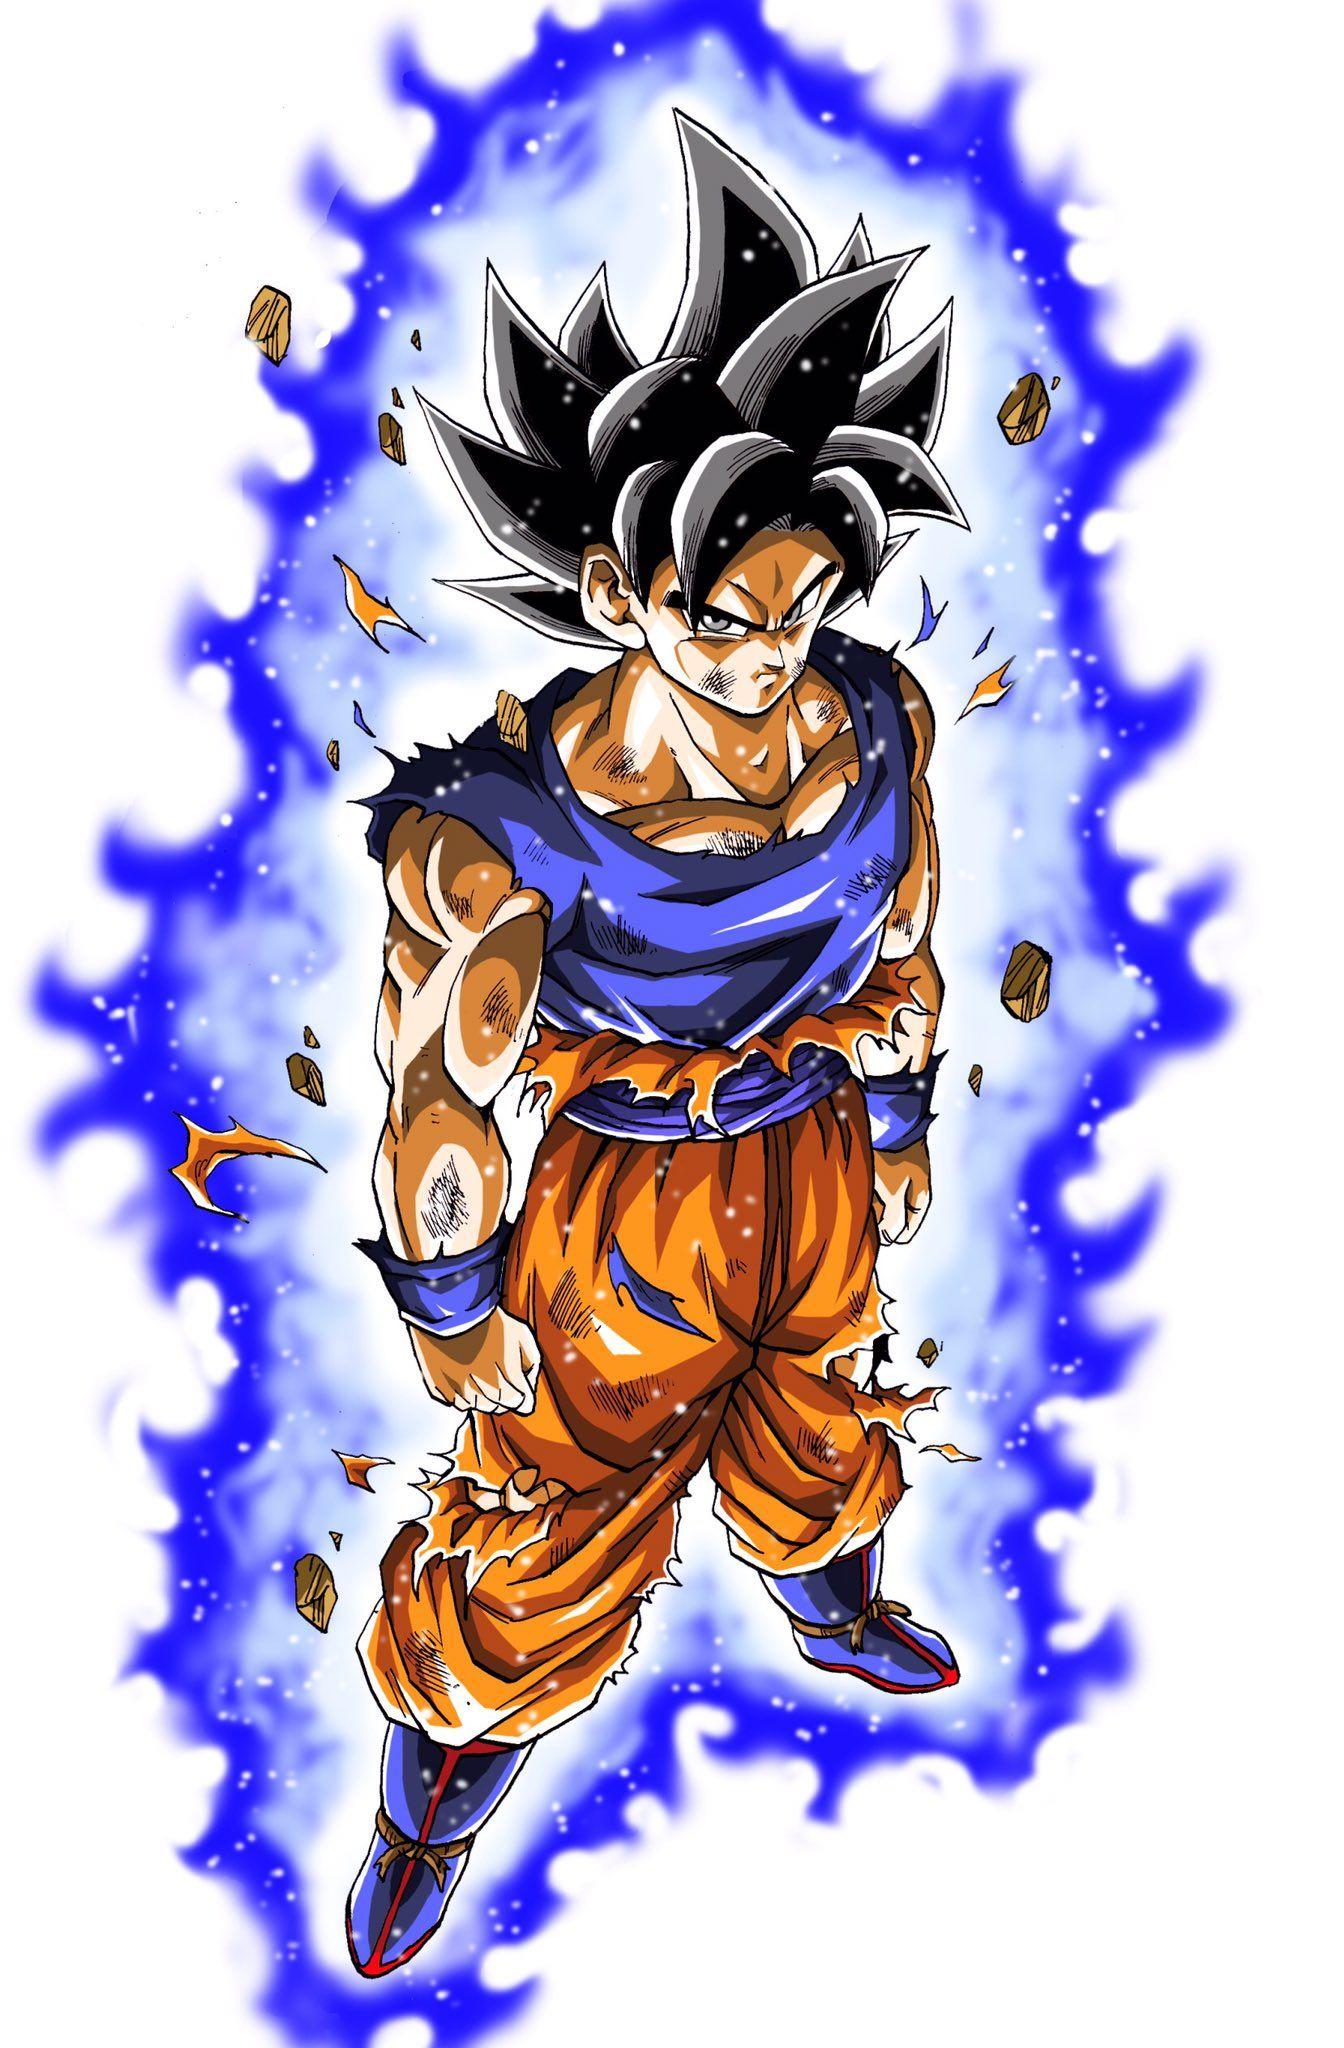 Pin De Tejas Ukalkar Em Dragon Ball Superzgt Anime